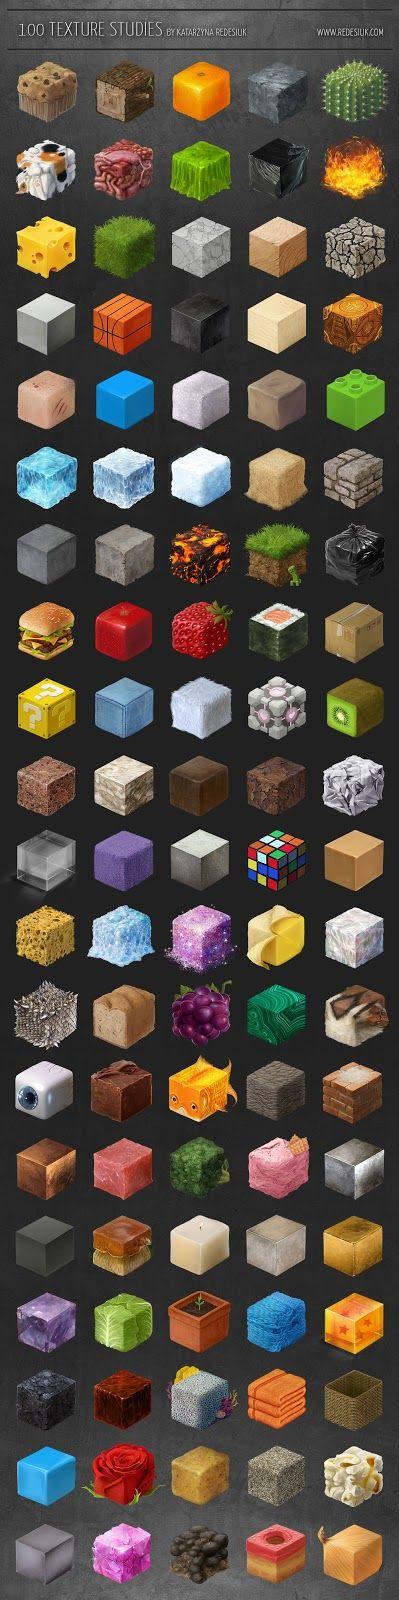 100_texture_studies_by_tanathe-d5yo9un